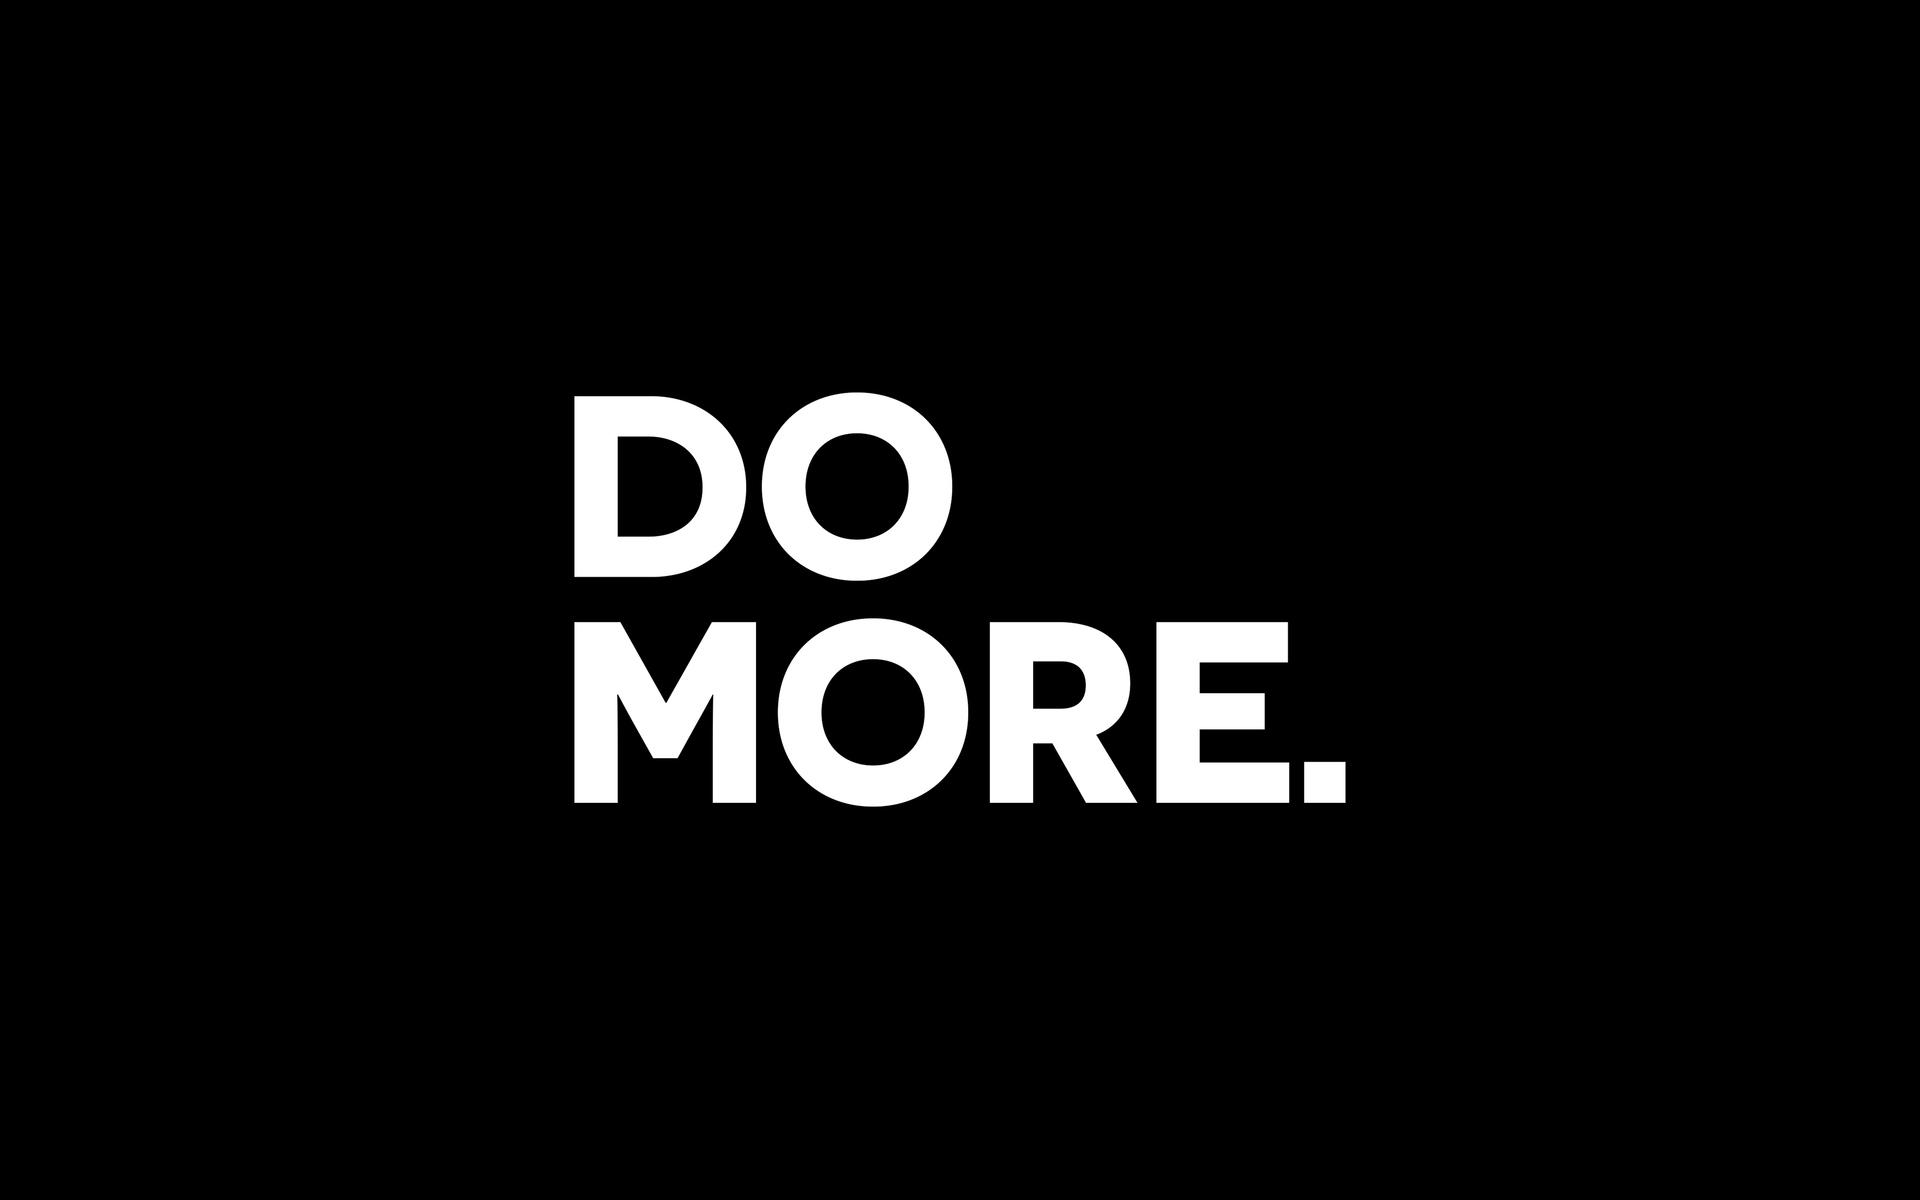 do-more-y3.jpg